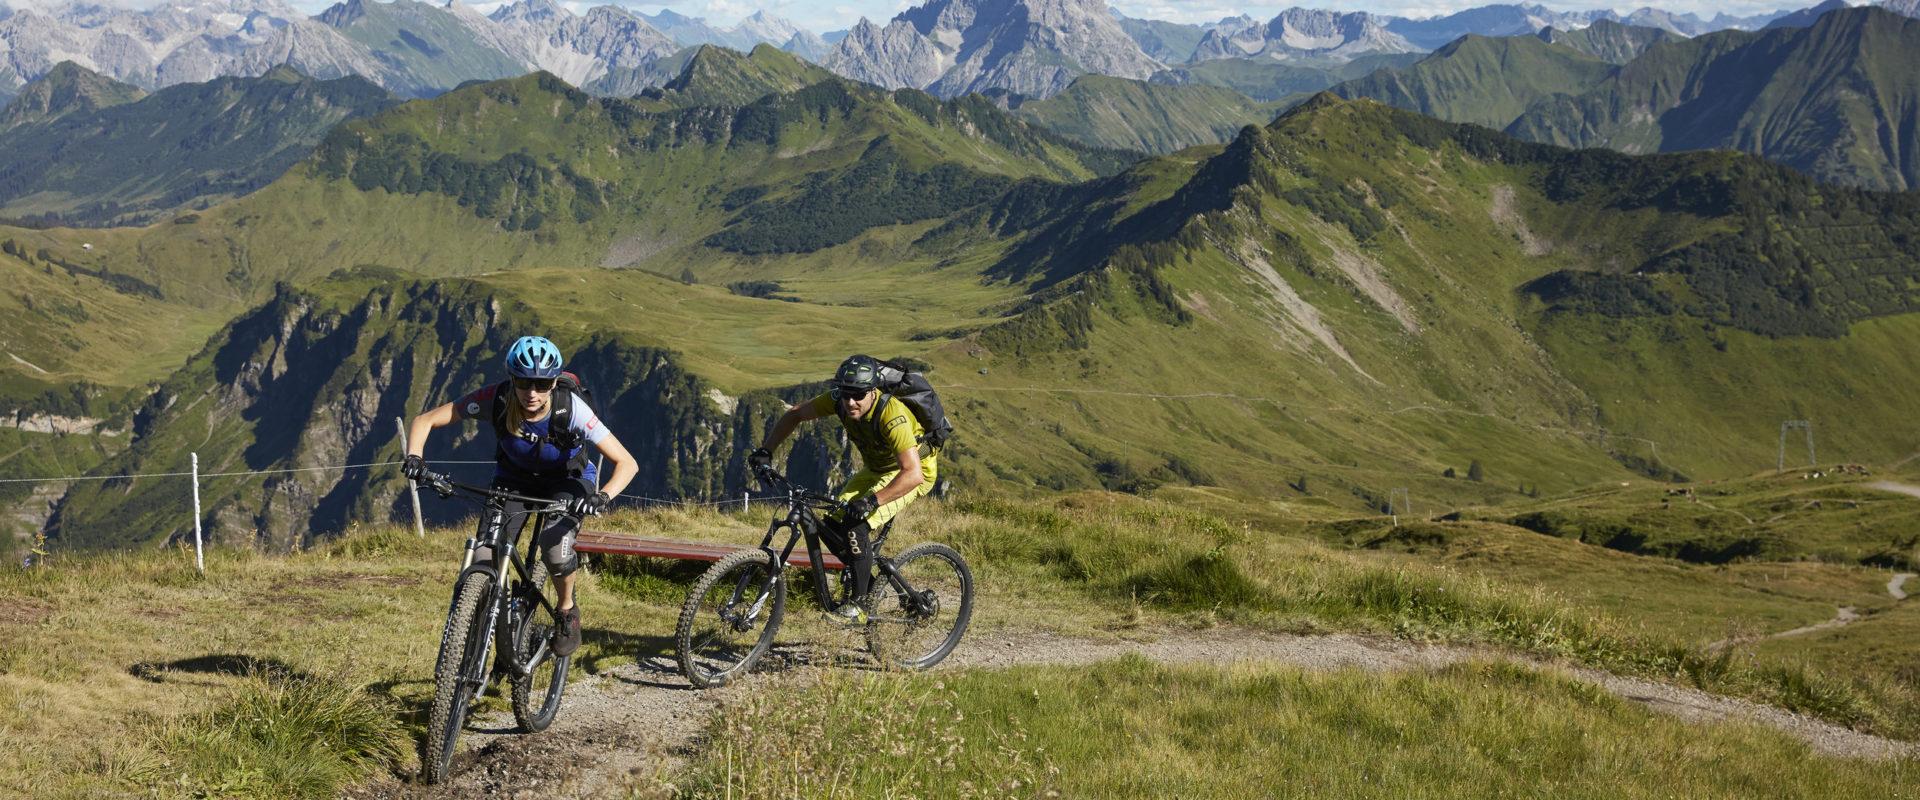 Mountainbike Au-Schoppernau © Adolf Bereuter undefined